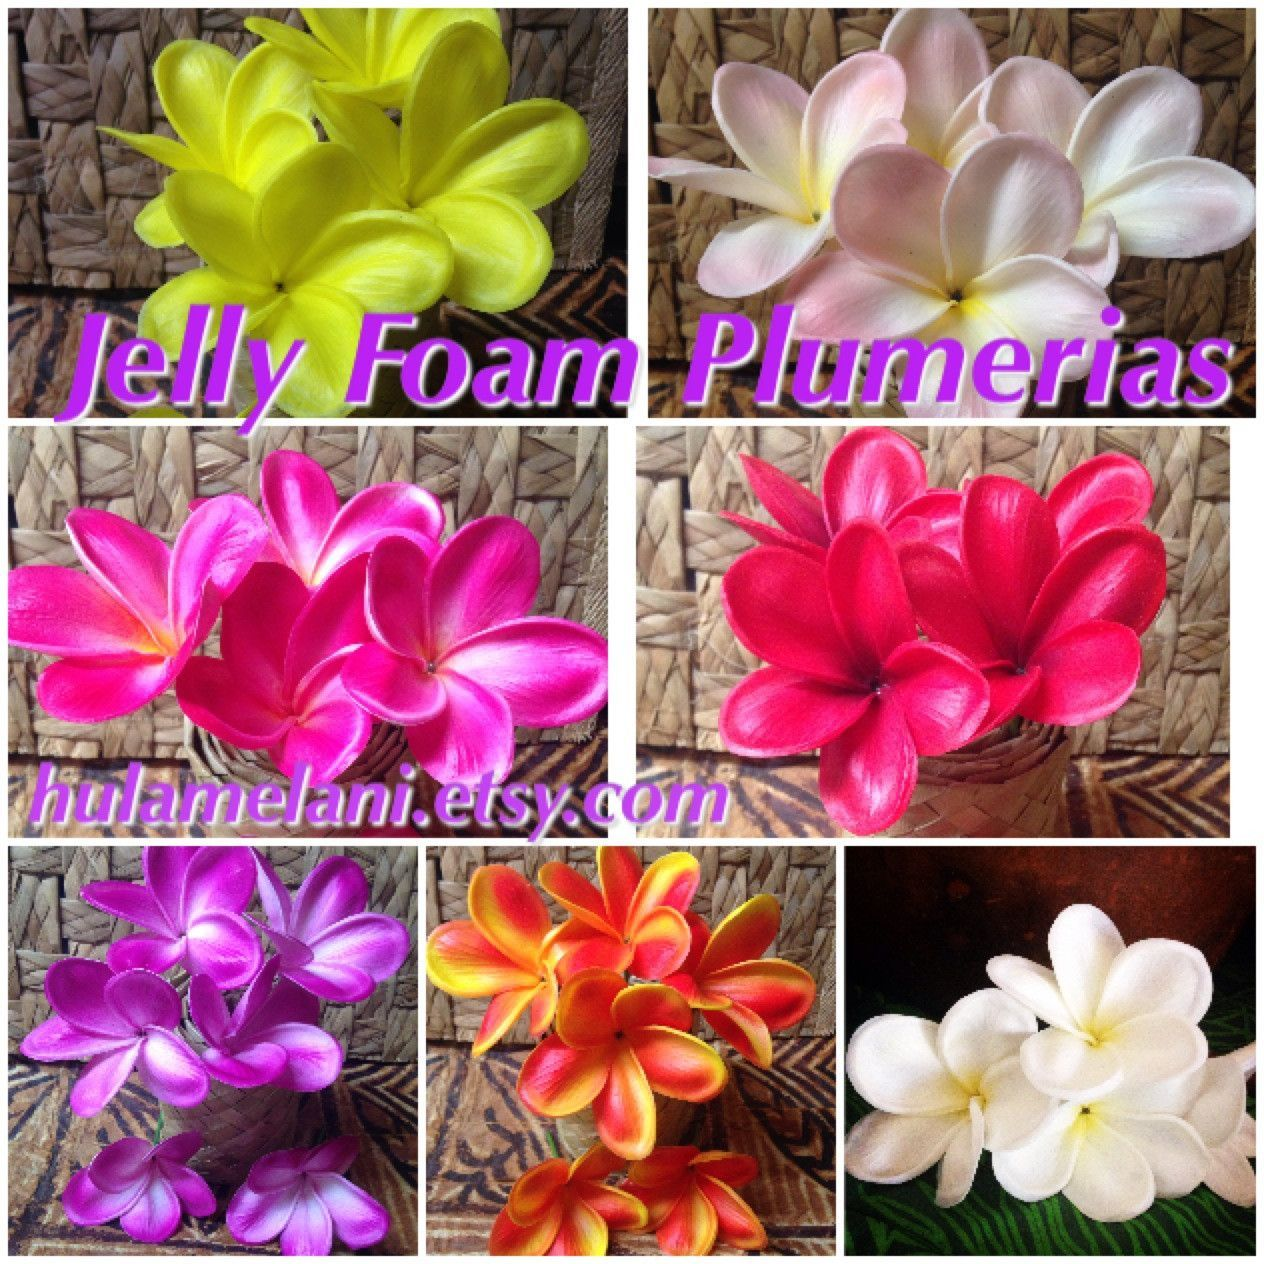 Jelly Foam Plumeria Flowers Pick Plumeria Flowers Elegant Party Decorations Flowers